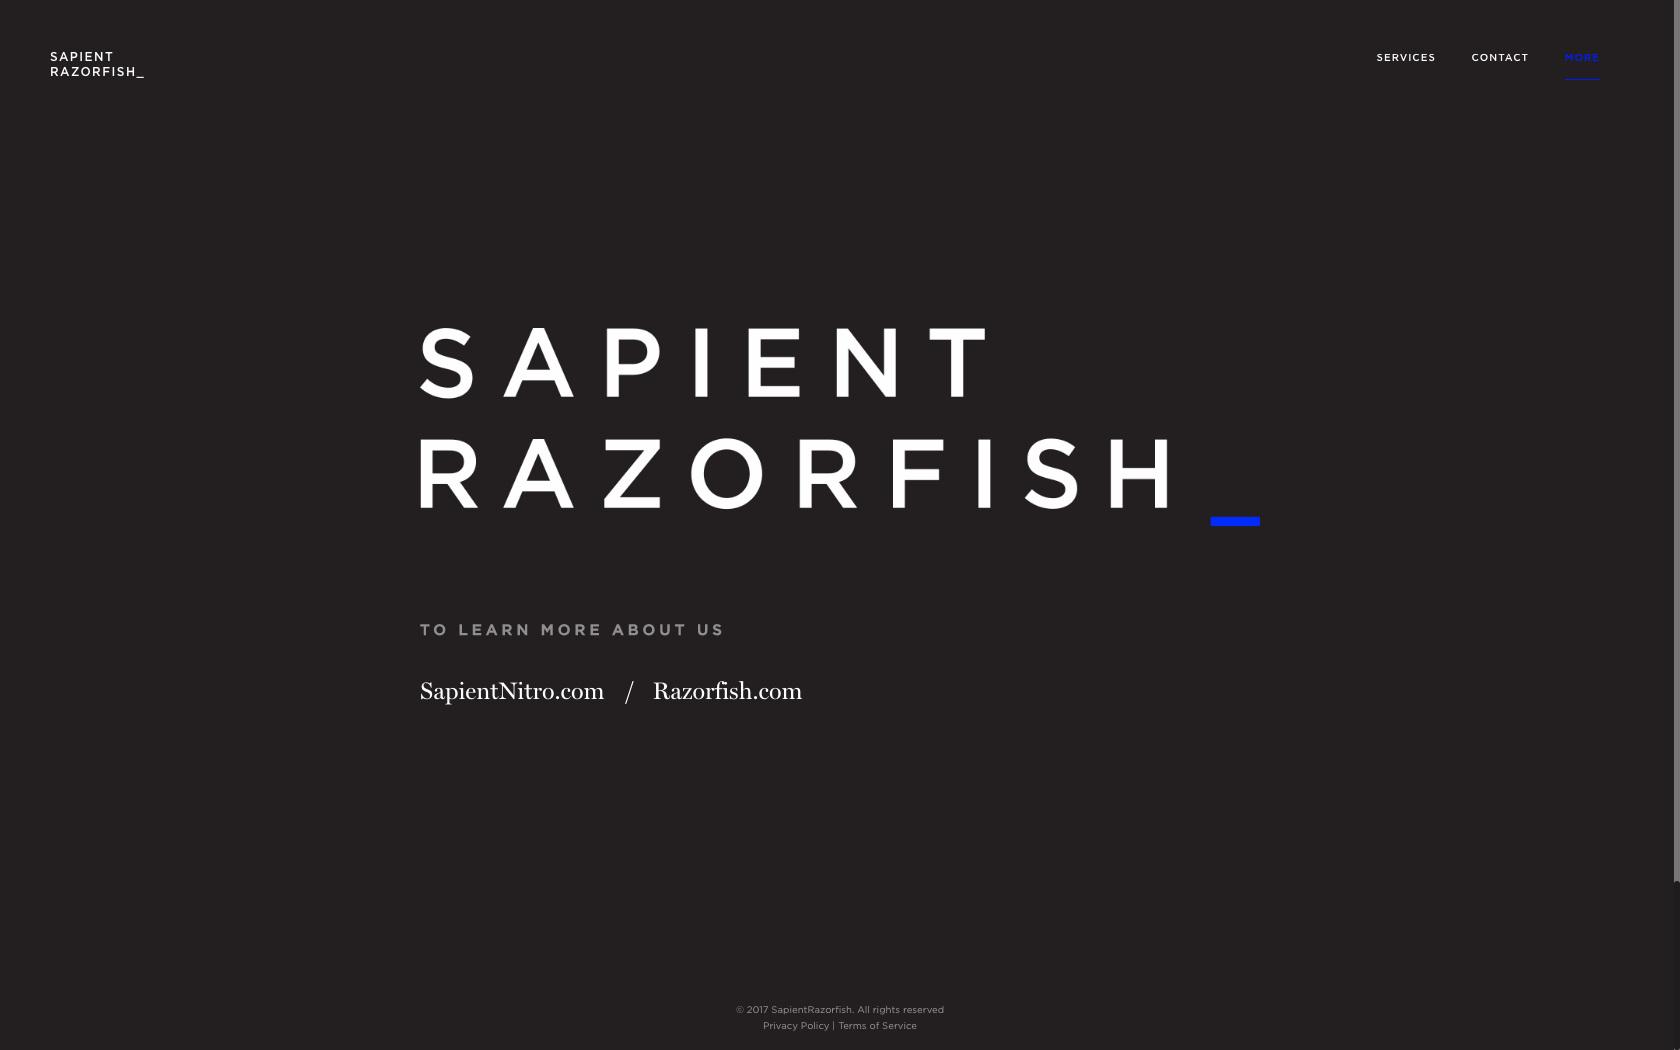 Sapientrazorfish 07